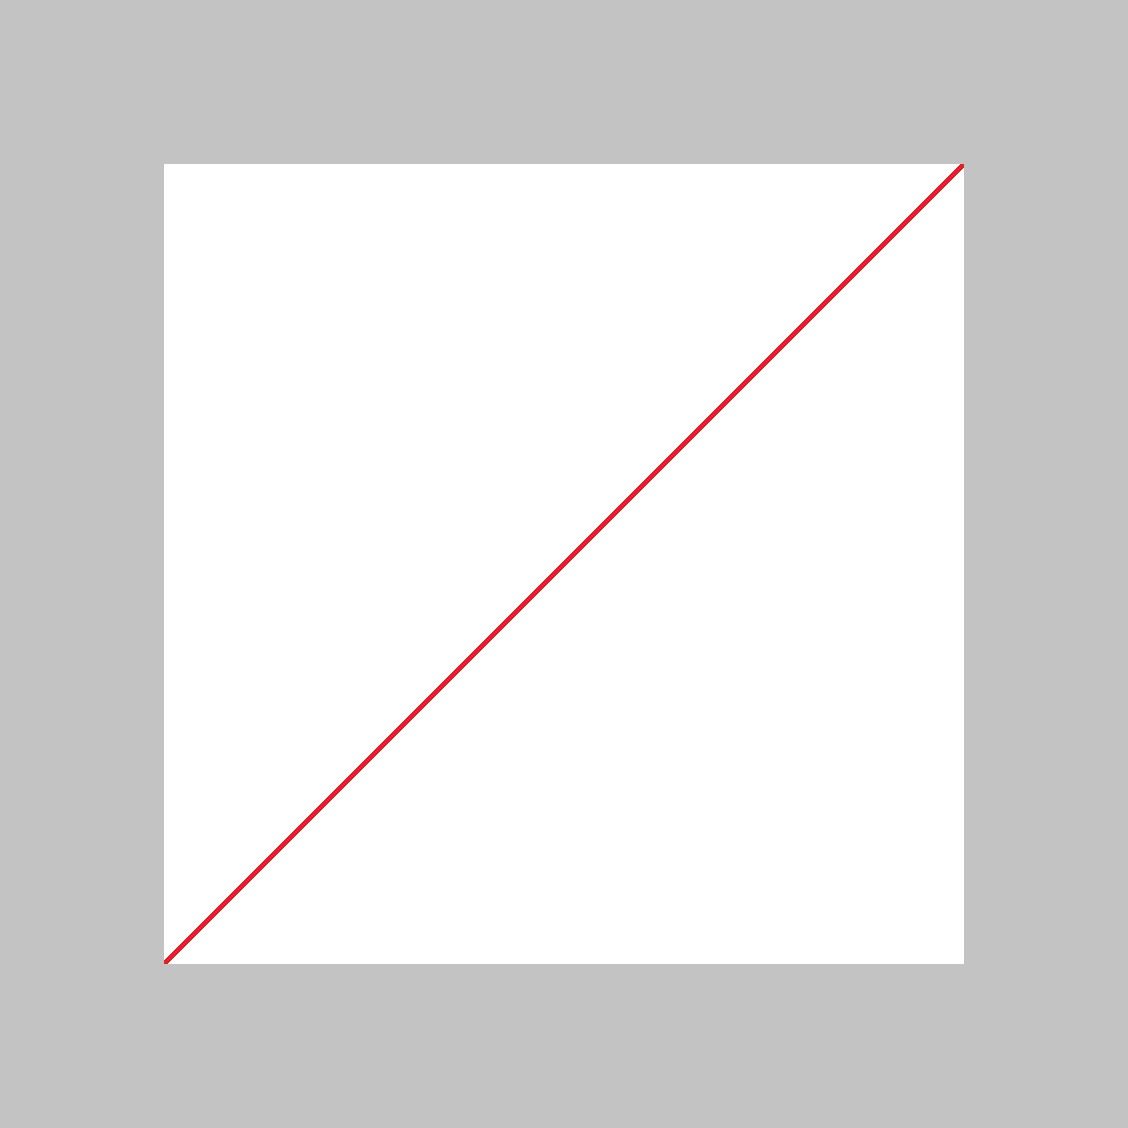 racine carré=1,4142...